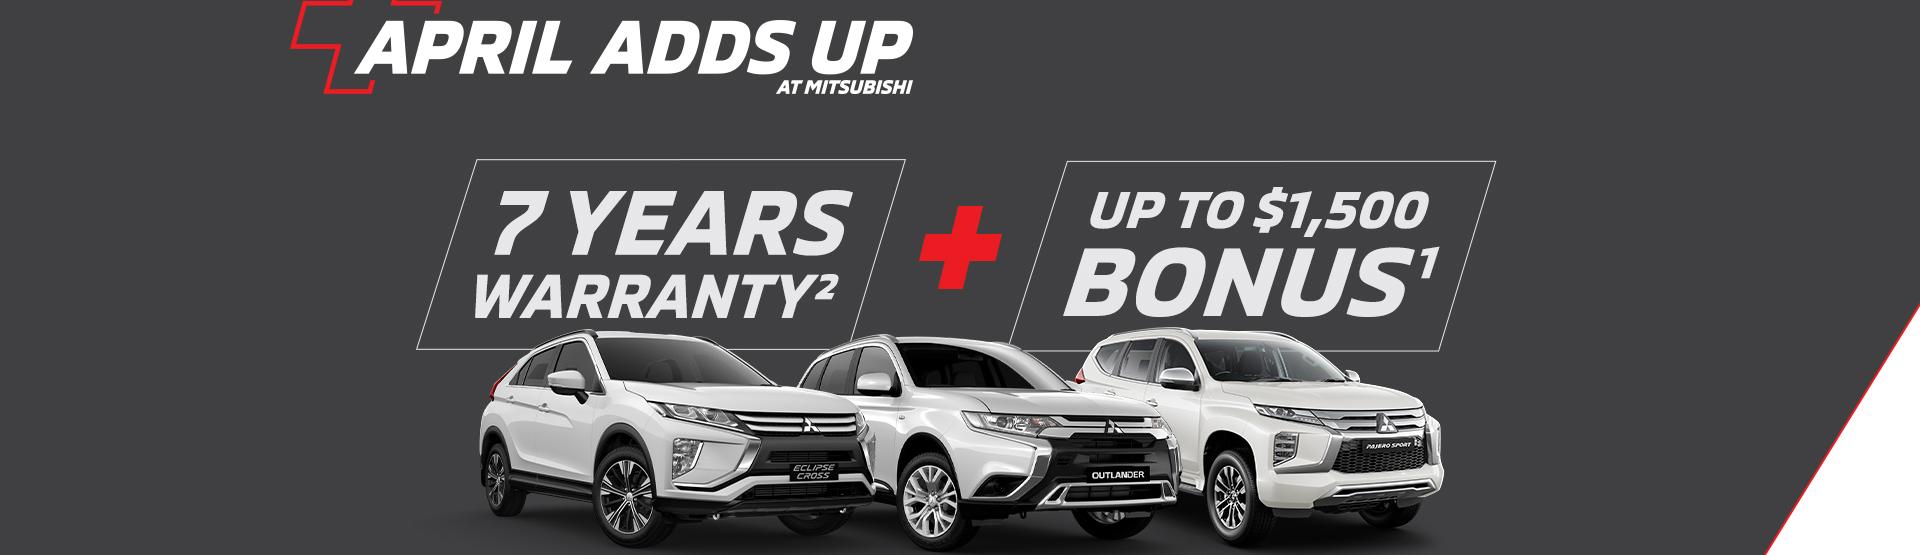 Mitsubishi Offers